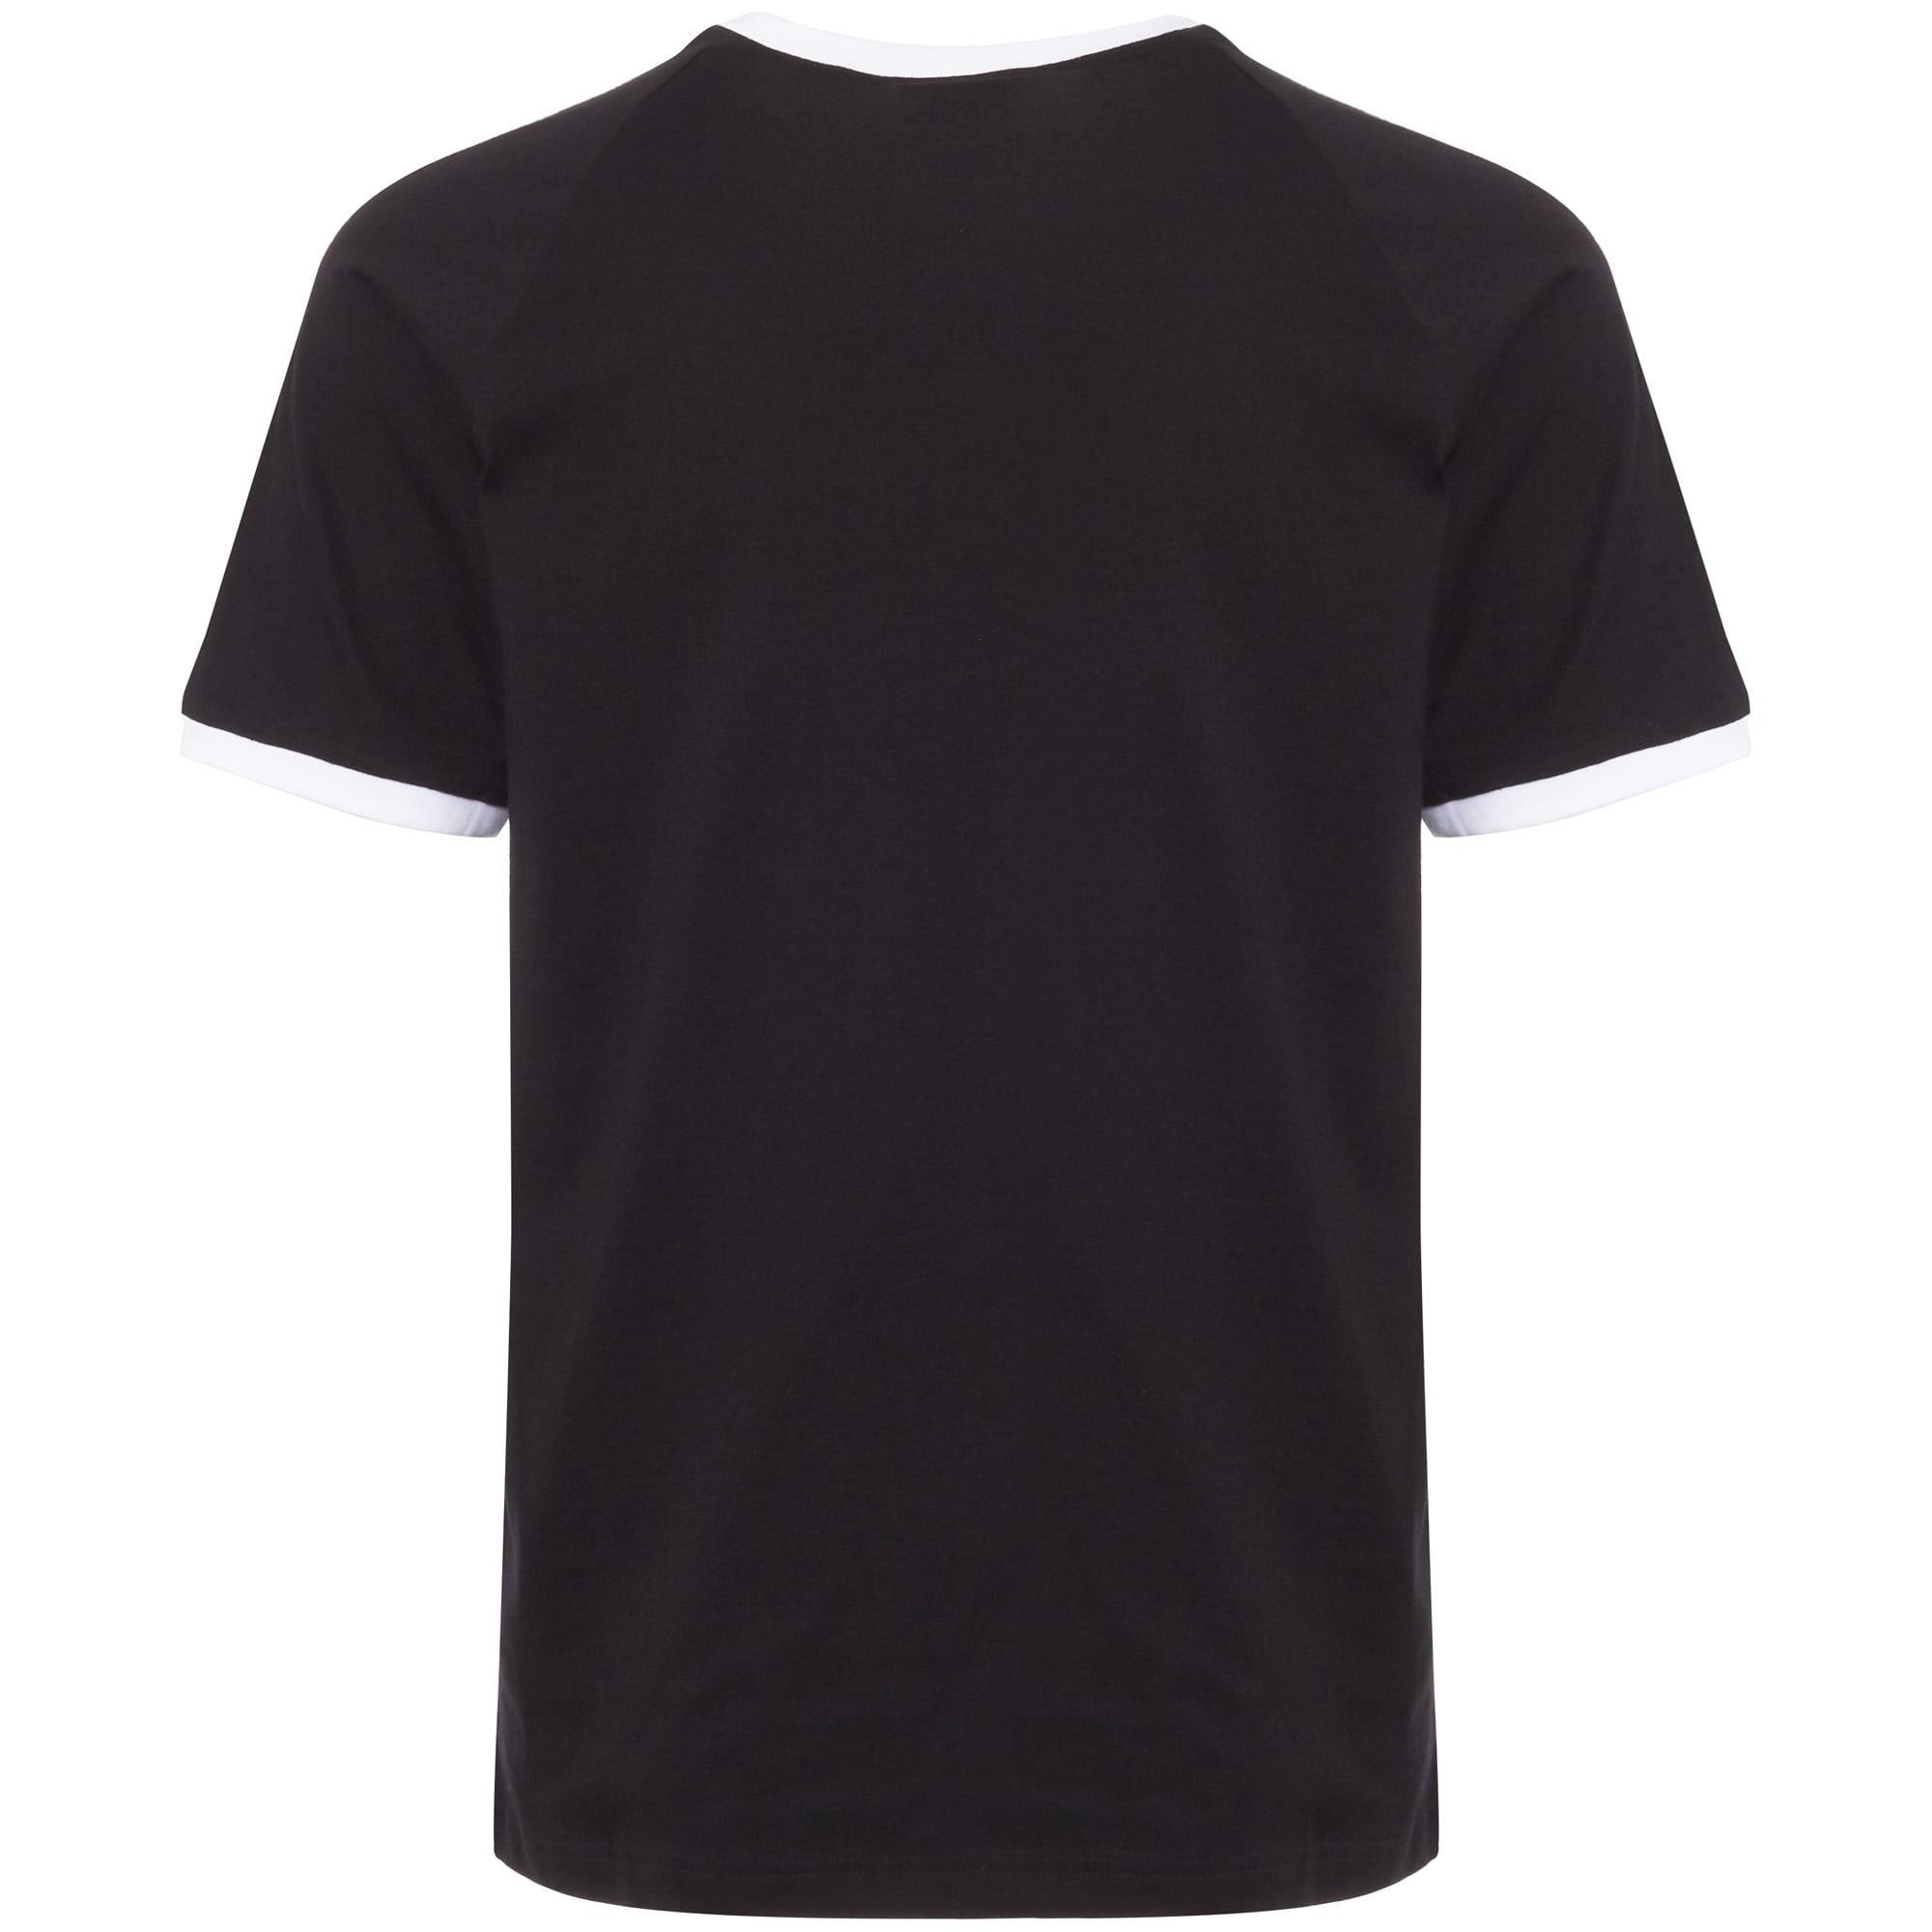 In Adidas California Adicolor Originals Cw1202 Schwarz shirt T v44wqpF